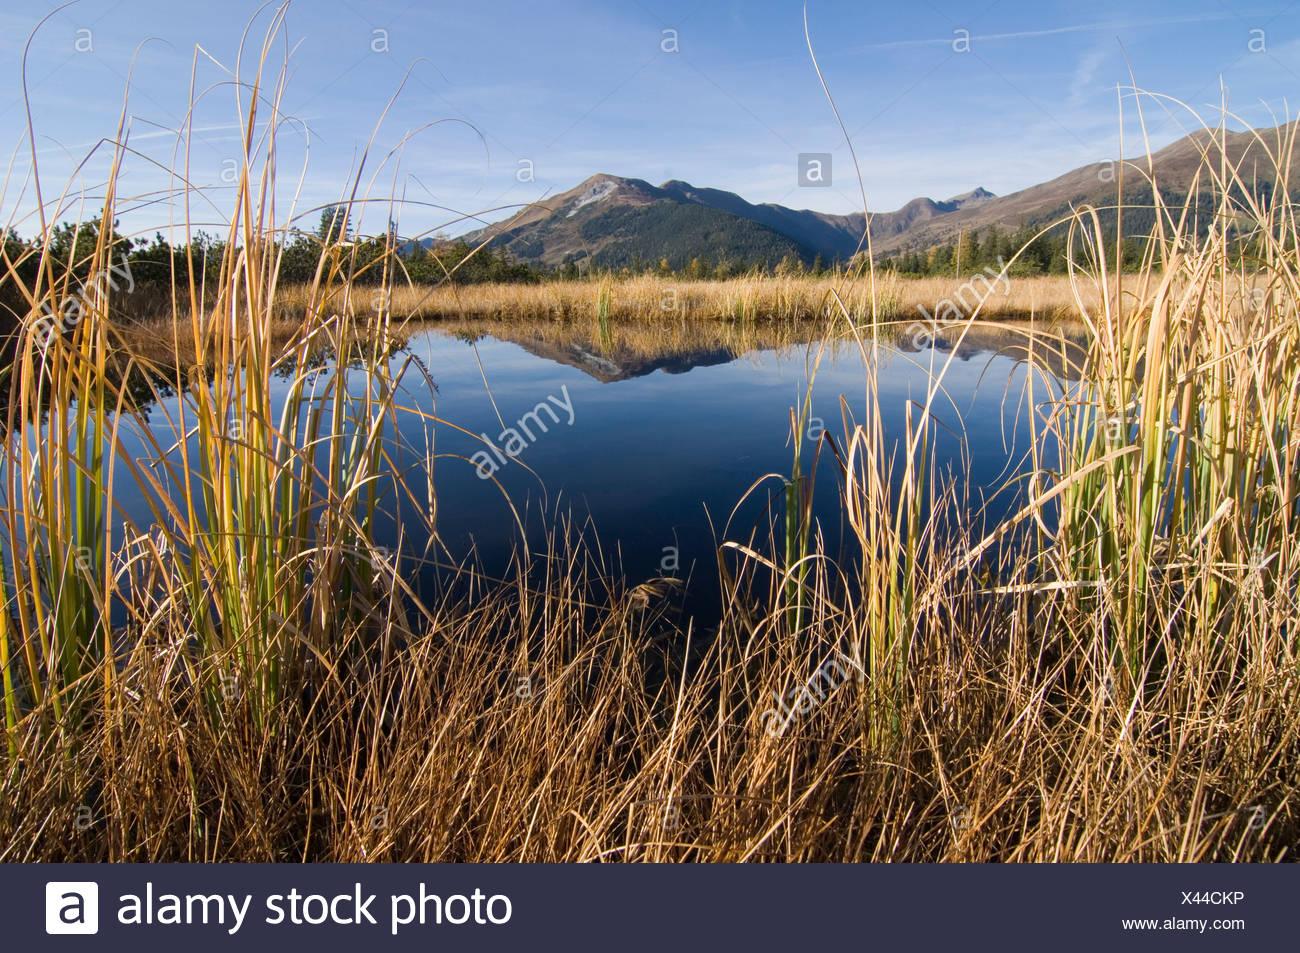 Marshland lake at Sieben Moesern, North Tirol, Austria, Europe Stock Photo